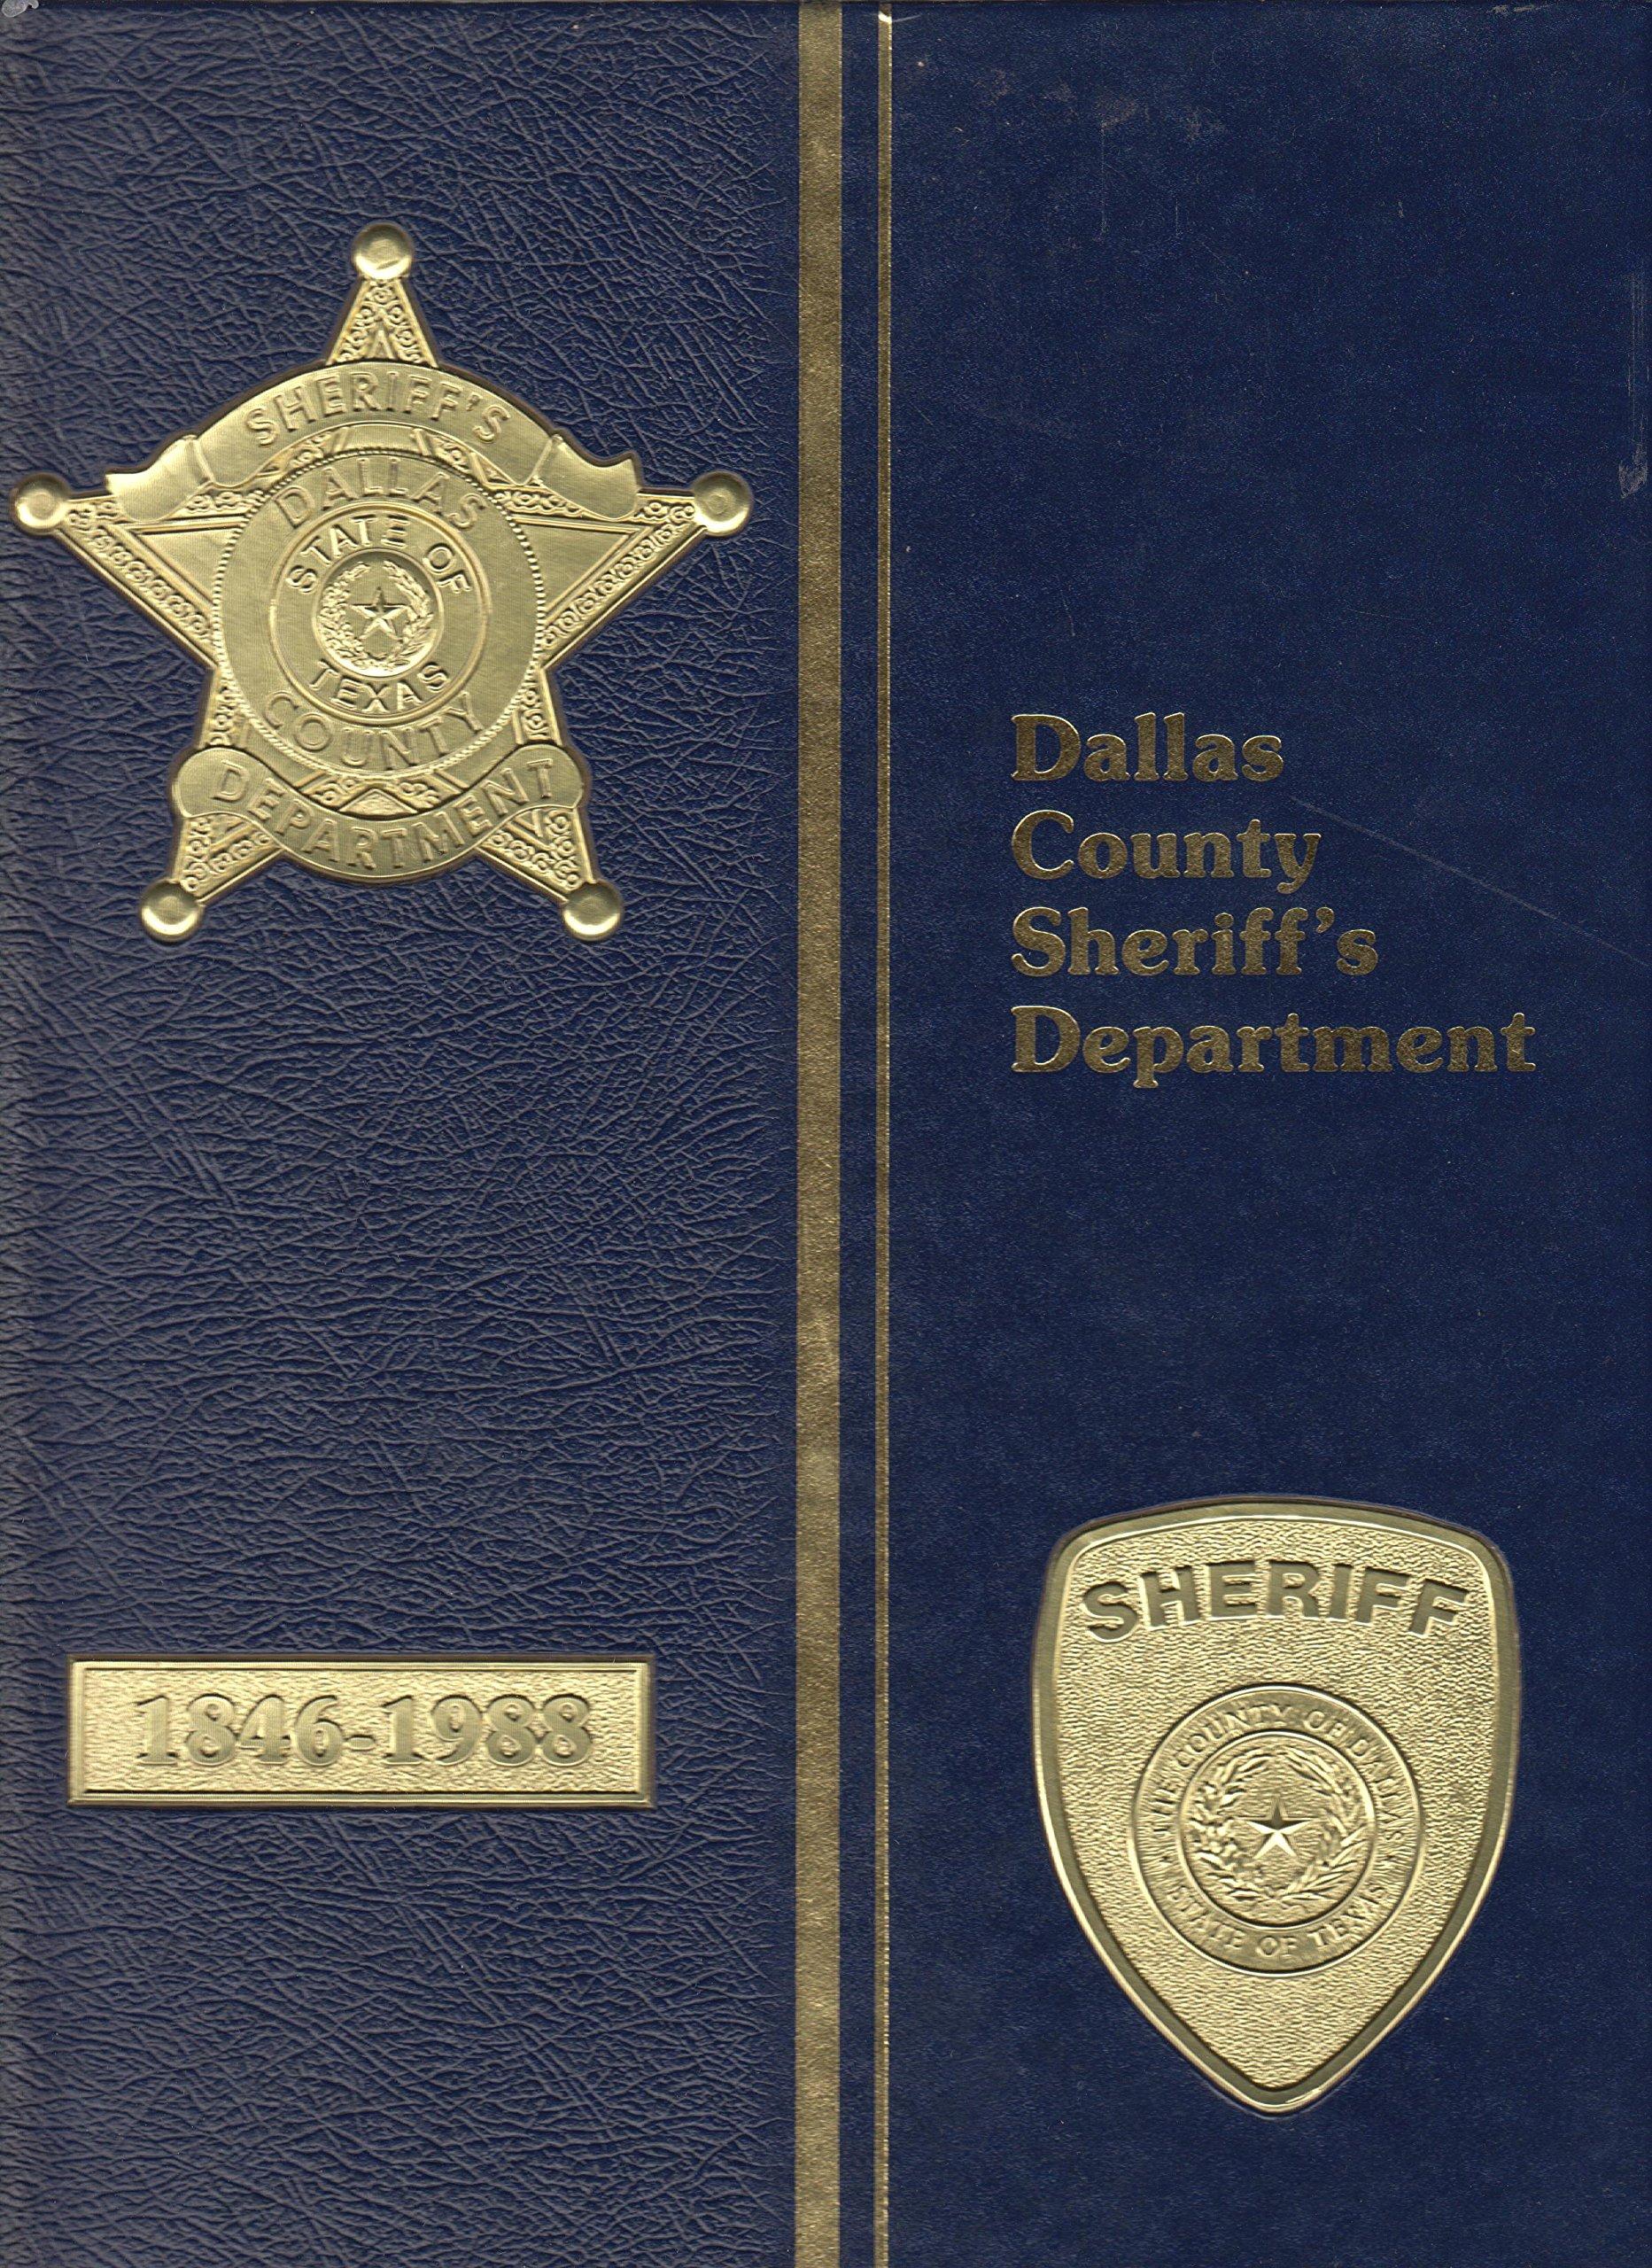 Dallas County Sheriff's Department 1846-1988: Jay Ward, Jim